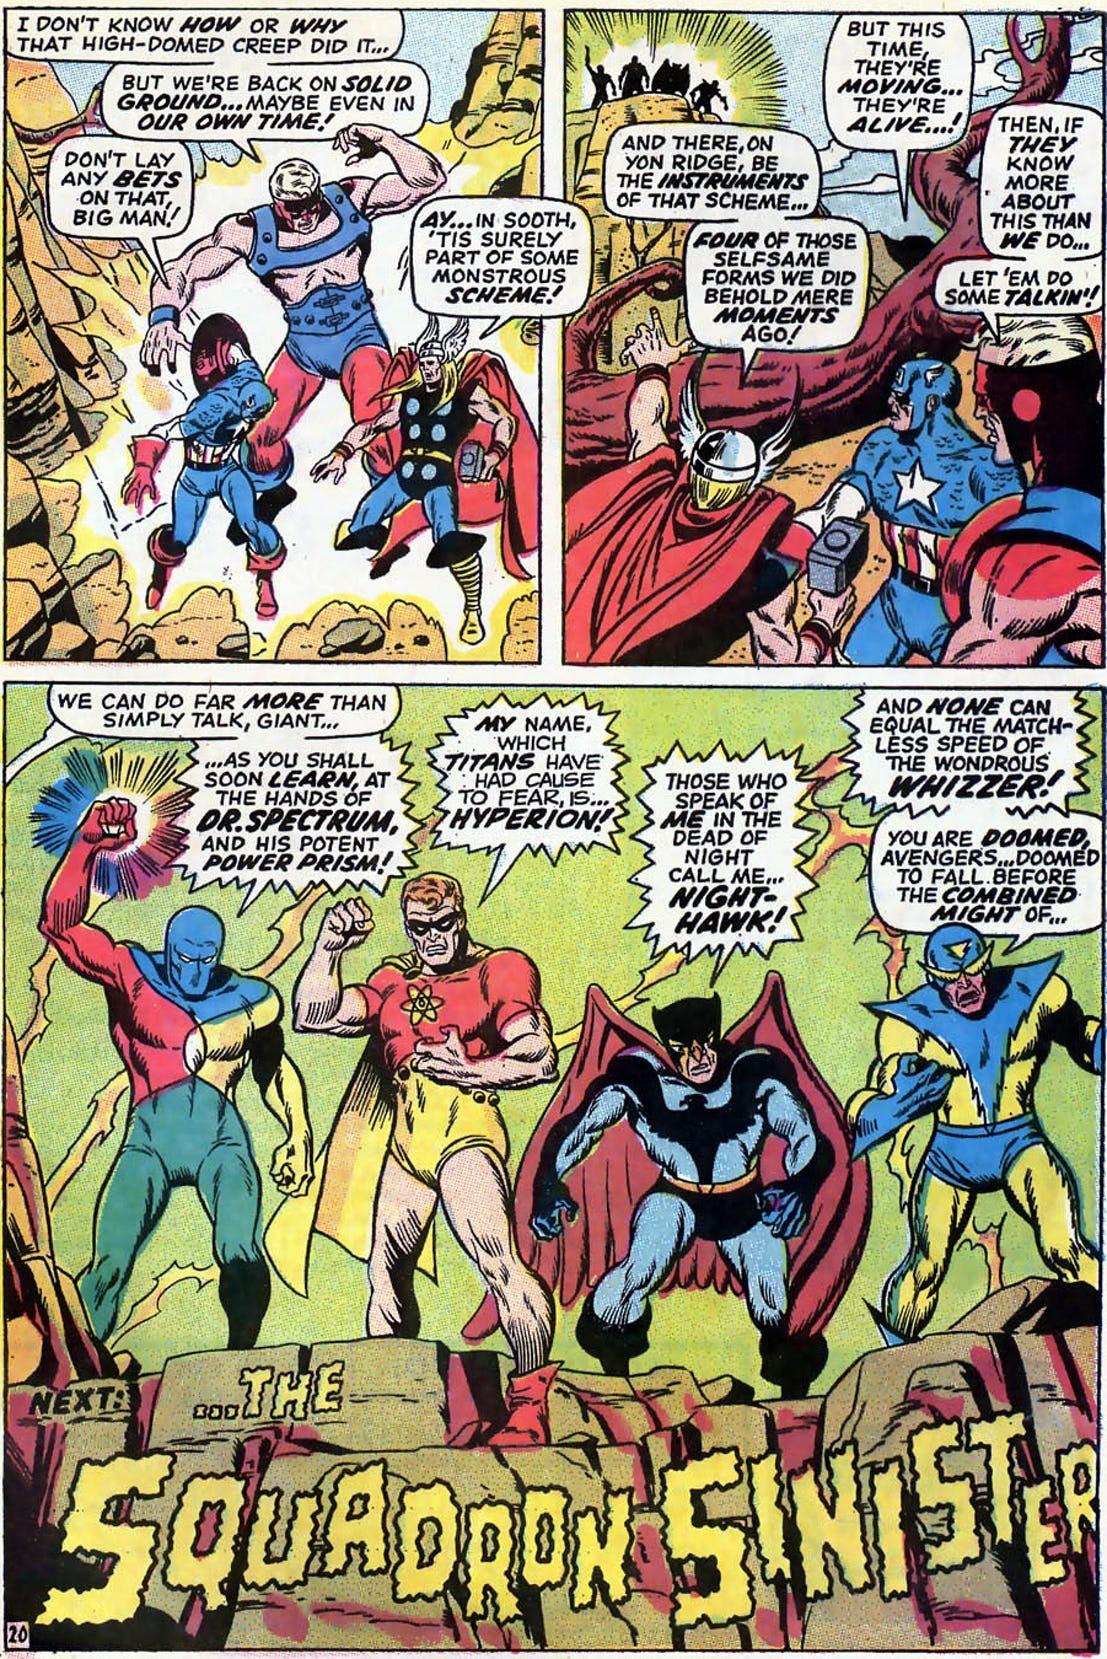 Avengers vol. 1 #69